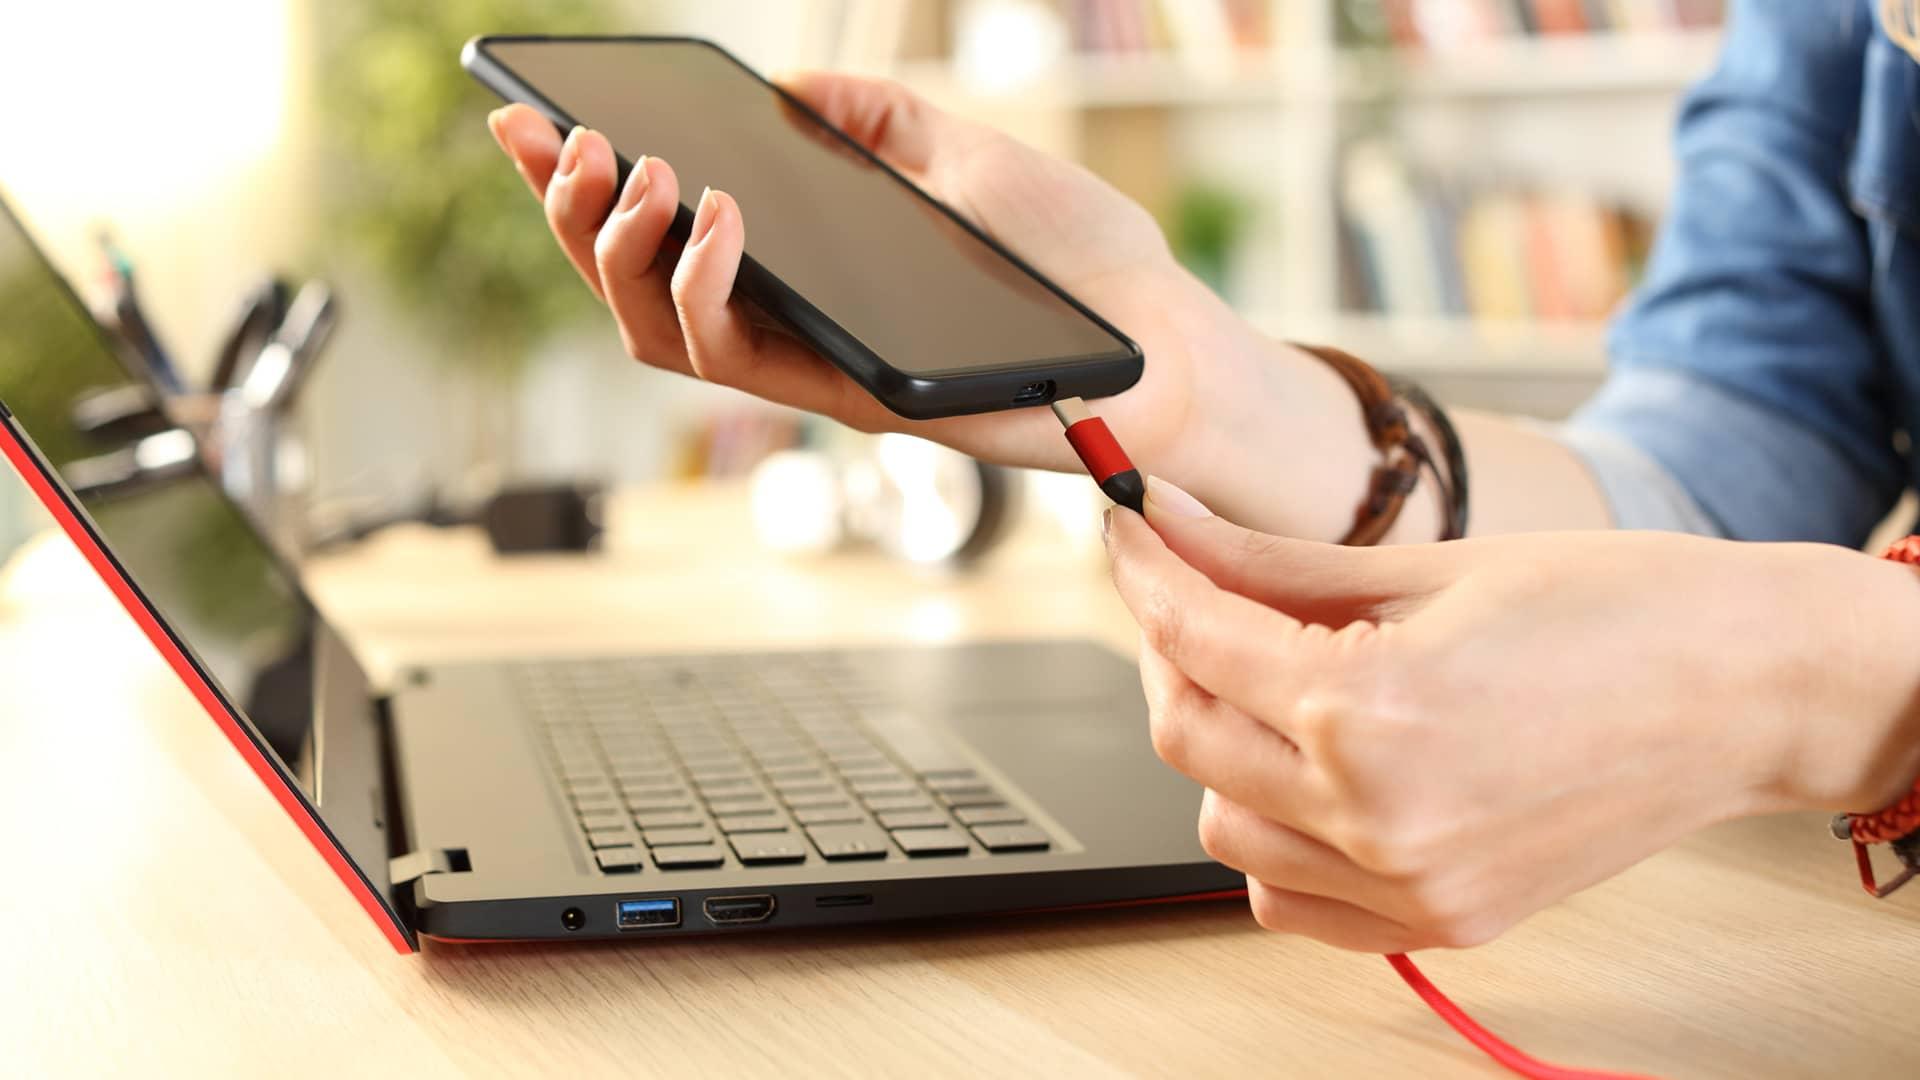 Recarga en Vodafone tu tarifa: descubre los pasos